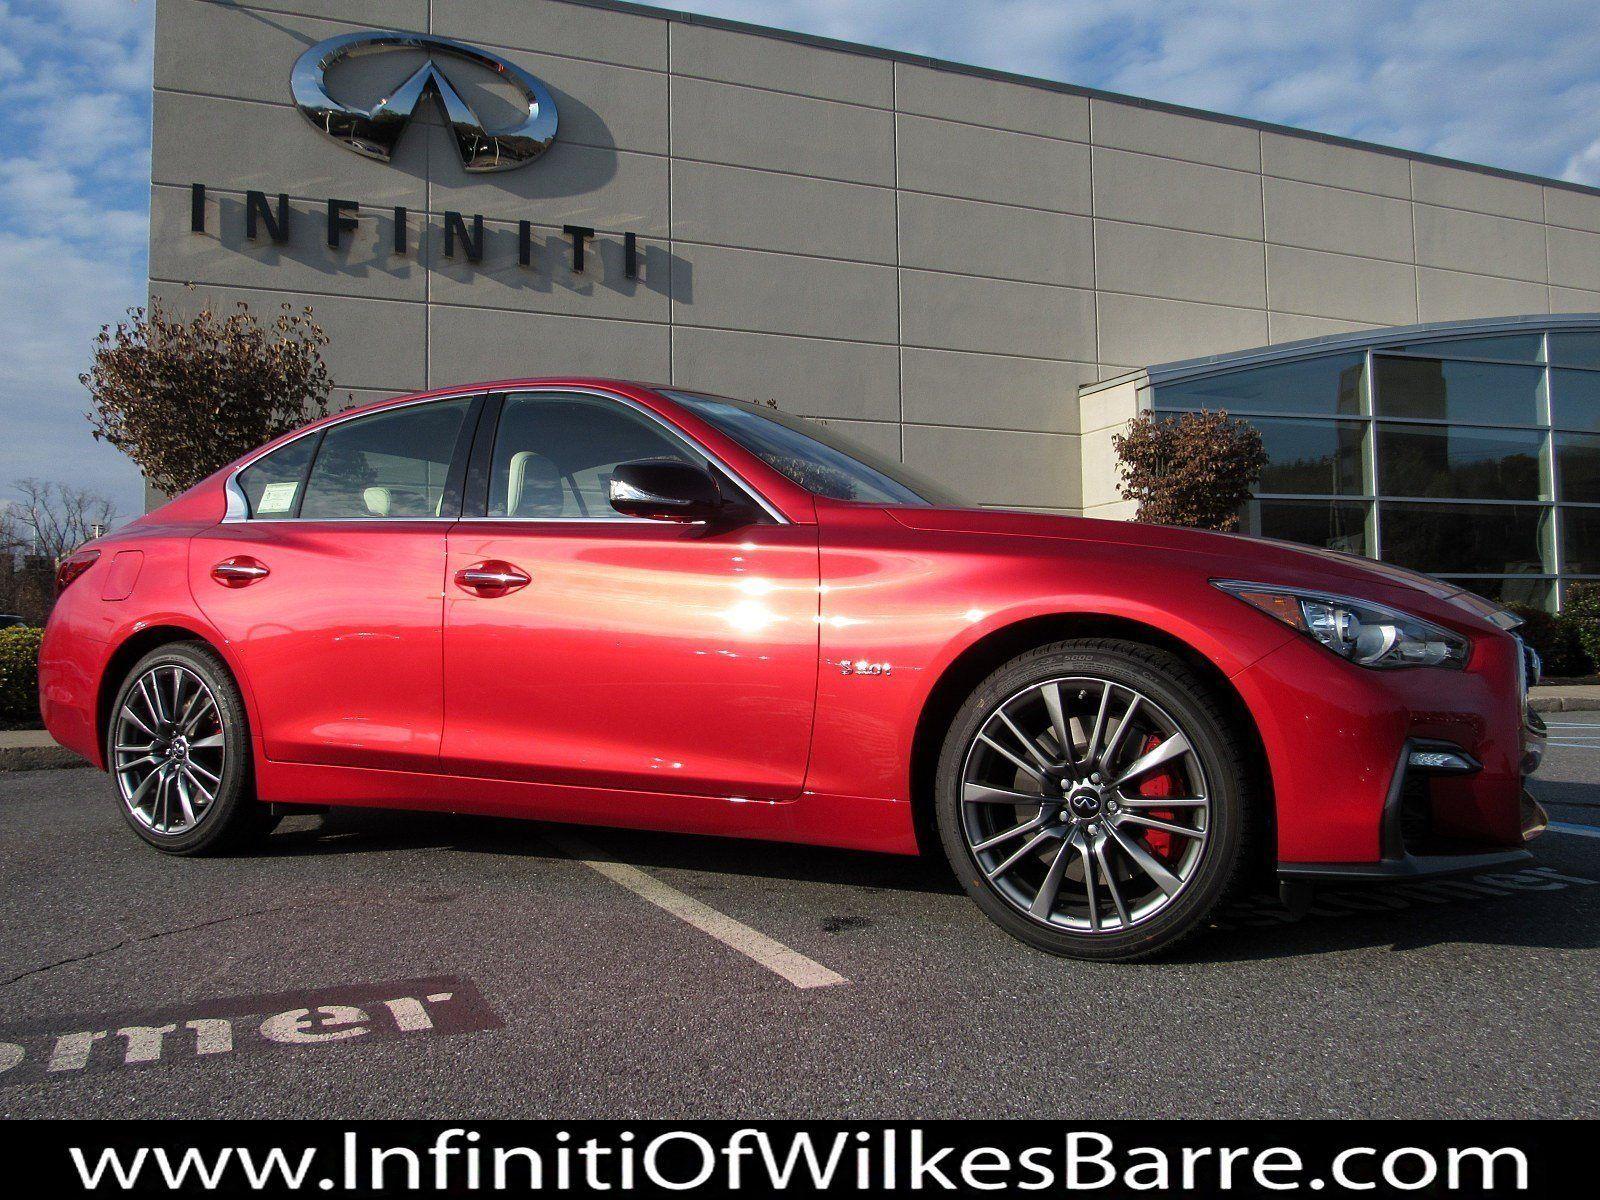 2020 Infiniti Q70 Specs And Review In 2020 Infiniti Infiniti Q50 Red Sport Lexus Ls